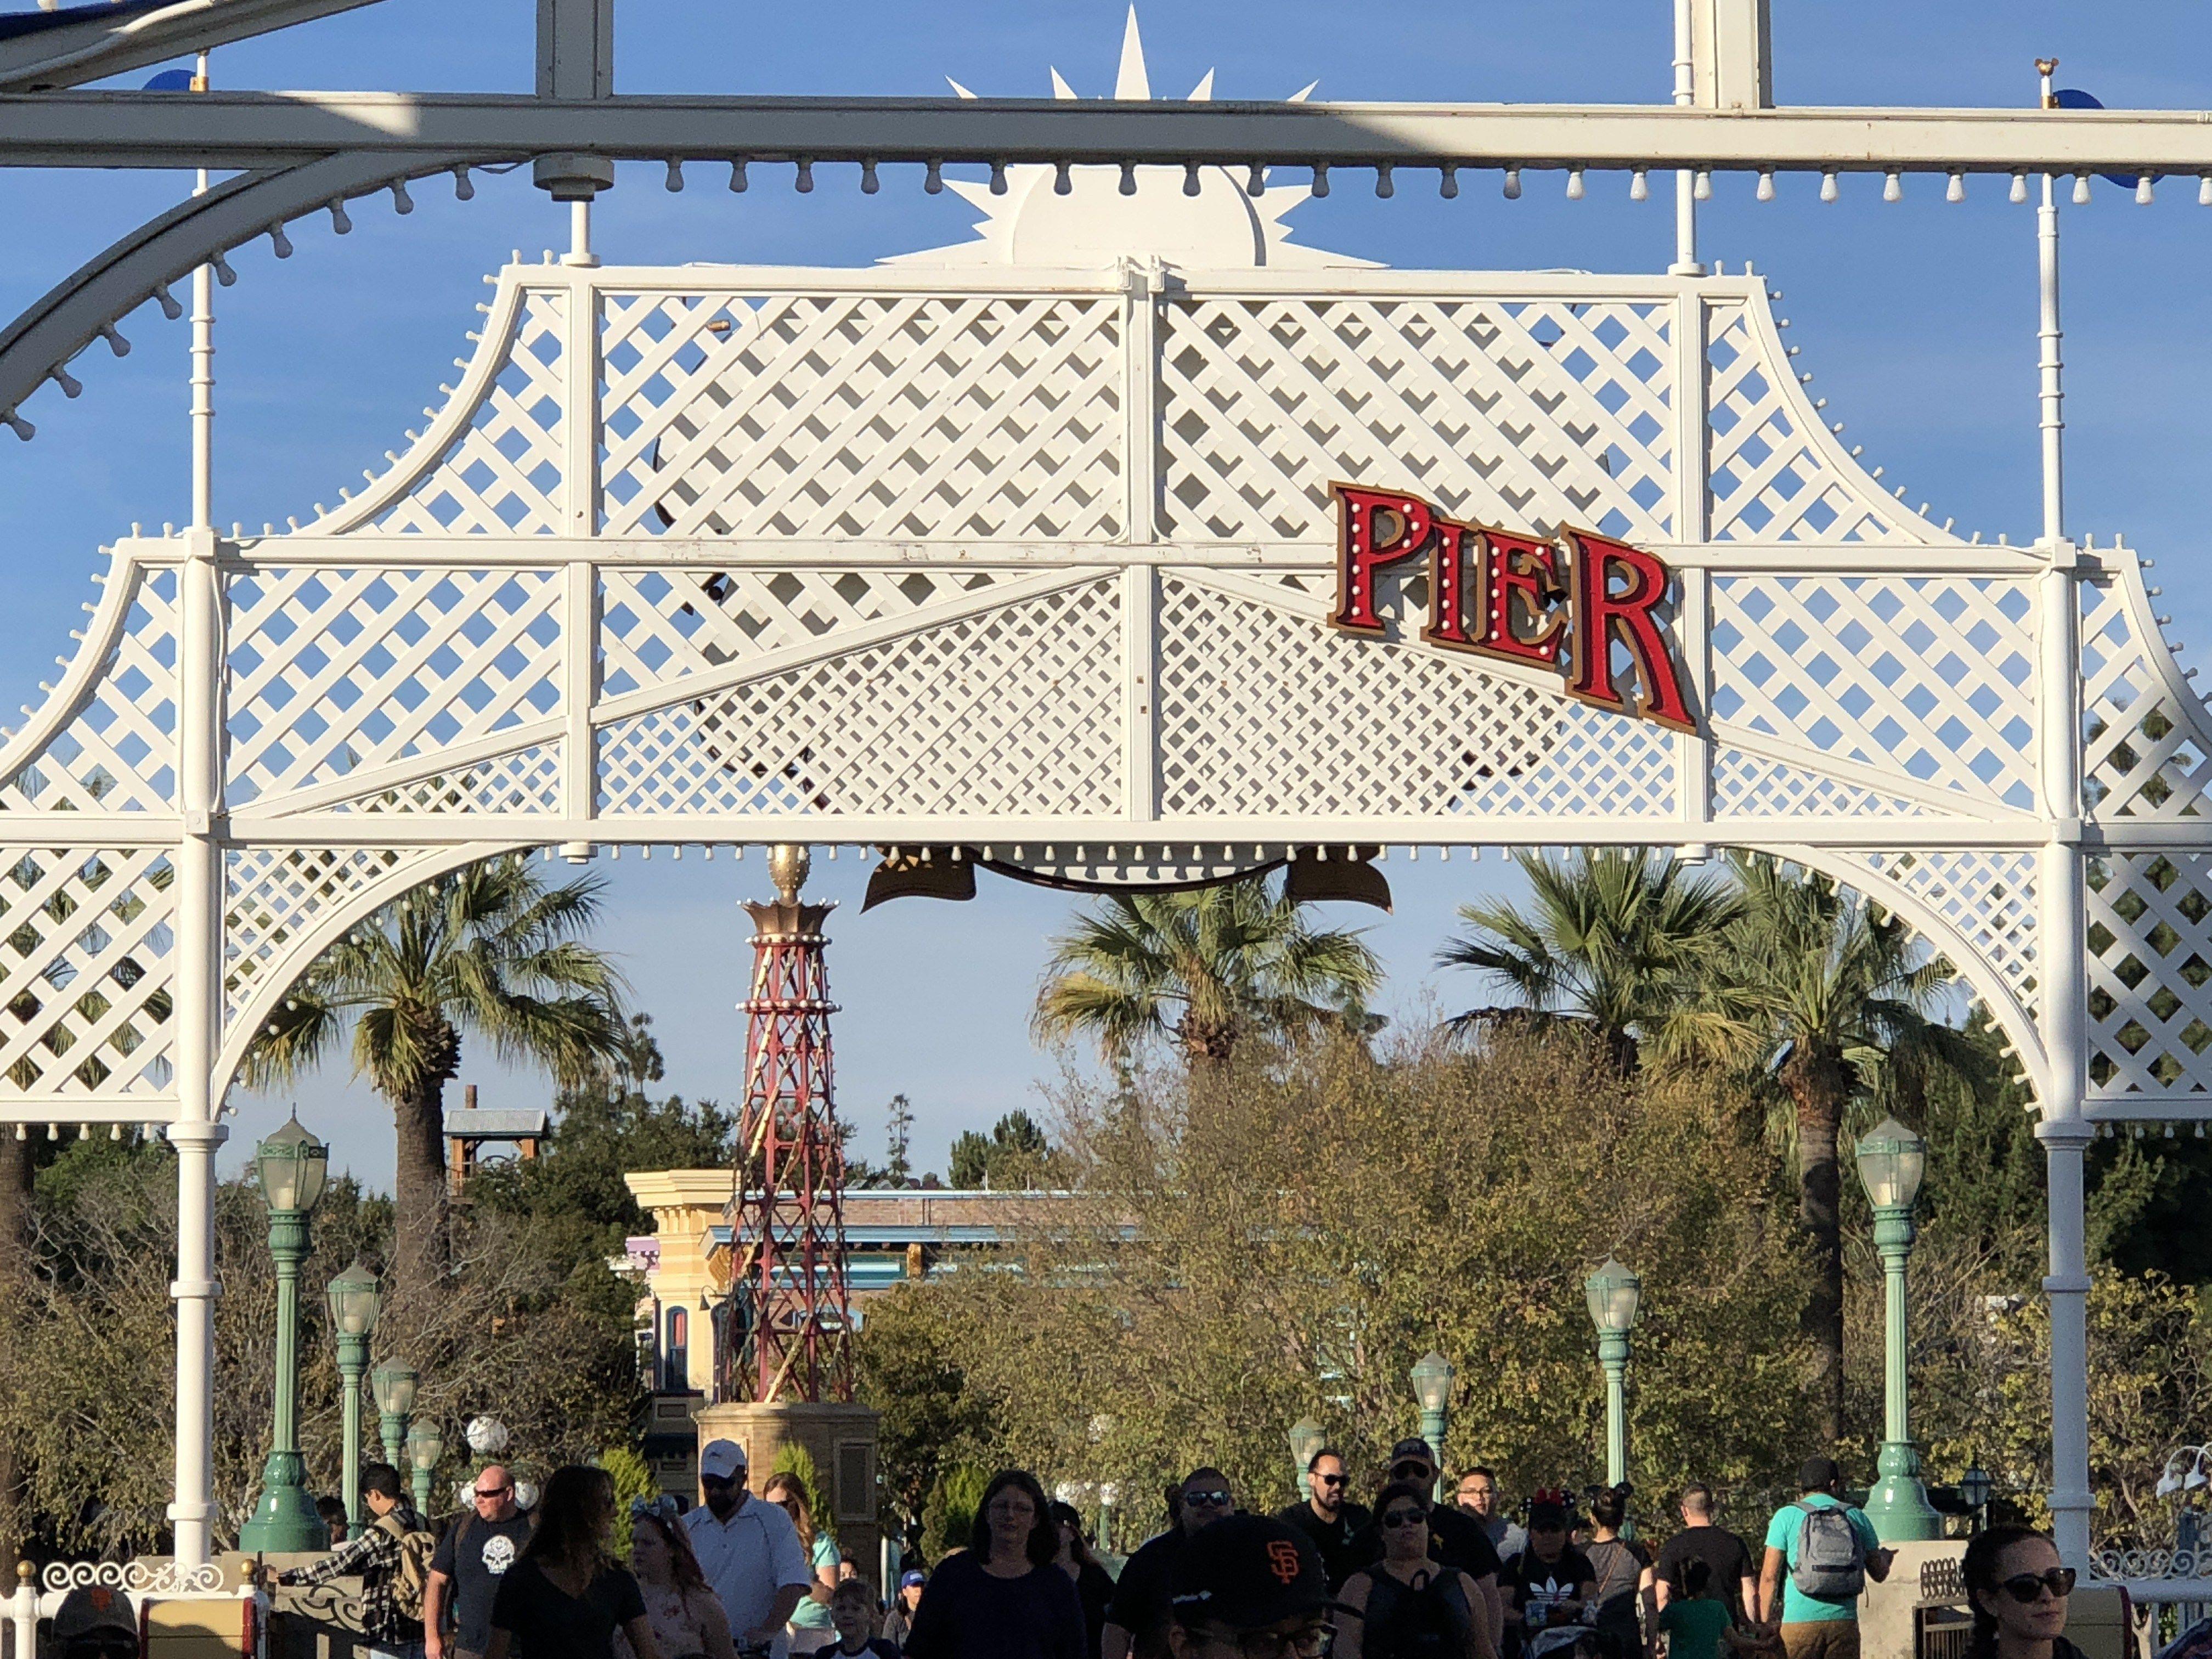 Disneyland Update 1/15/17 Featuring Main Street & Paradise Pier Refurbishments